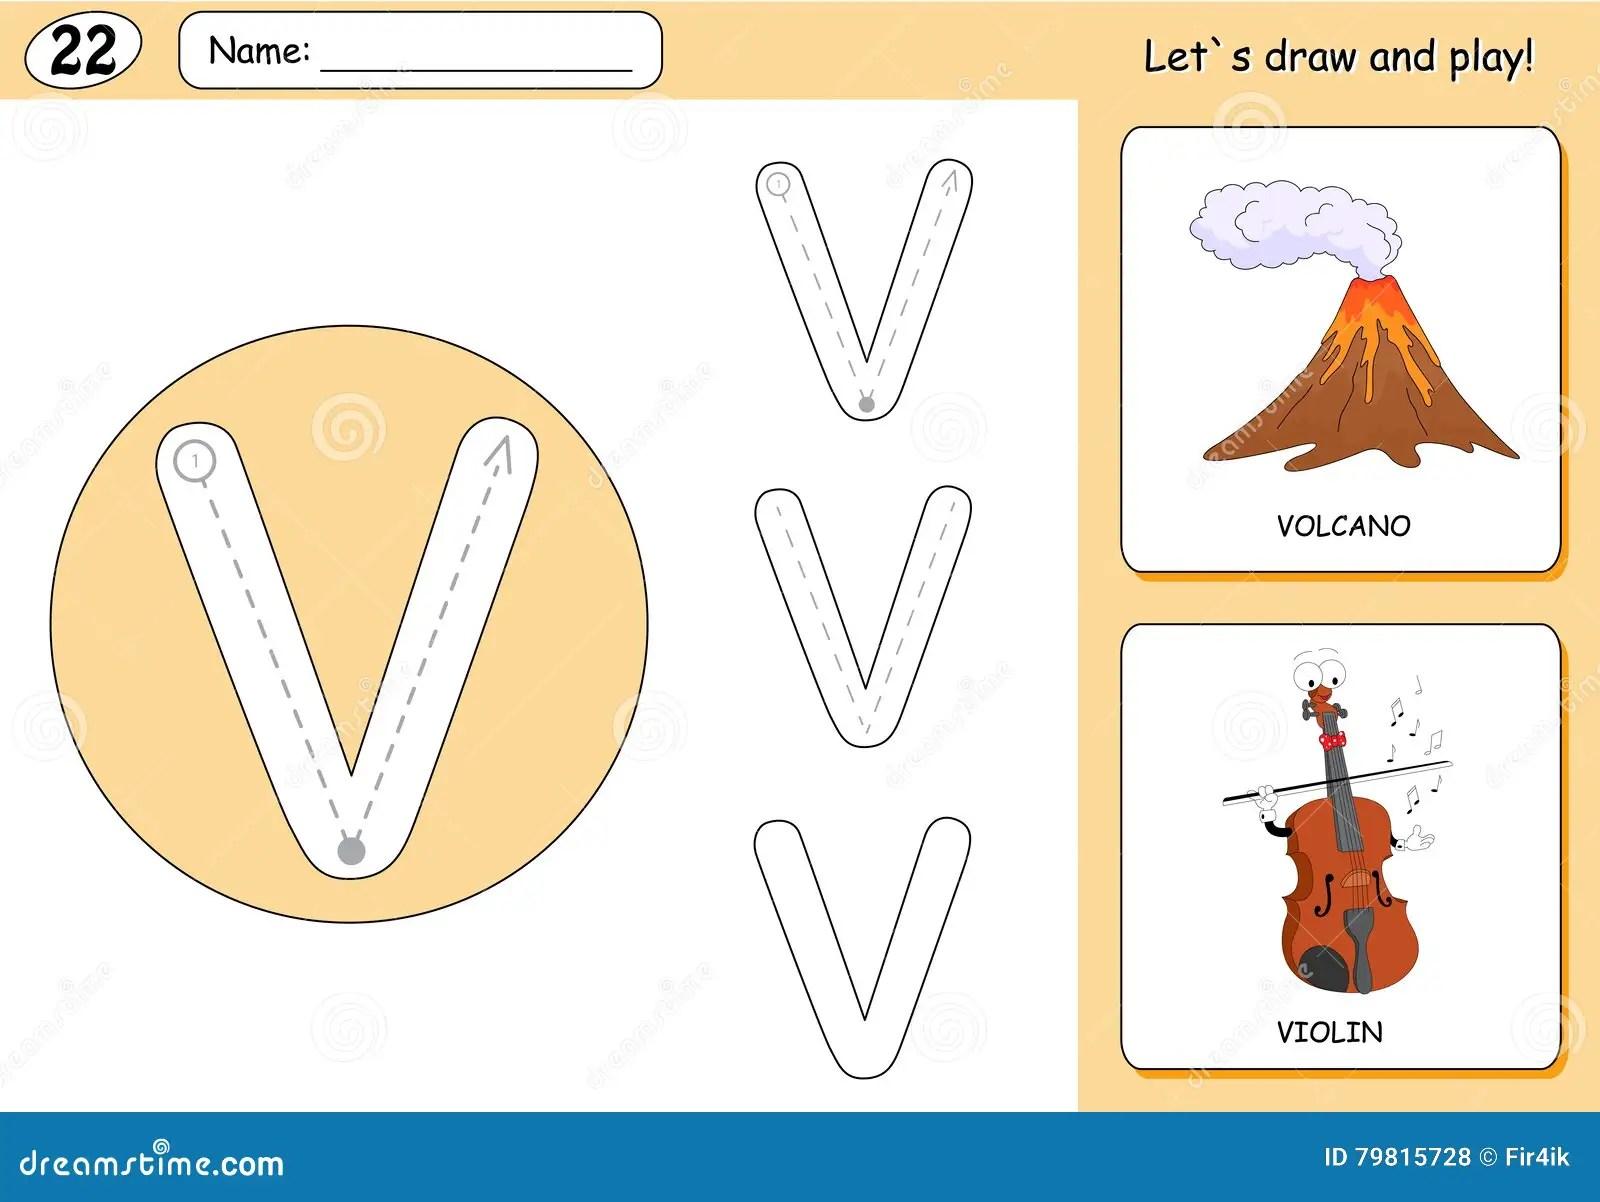 Cartoon Volcano And Violin Alphabet Tracing Worksheet